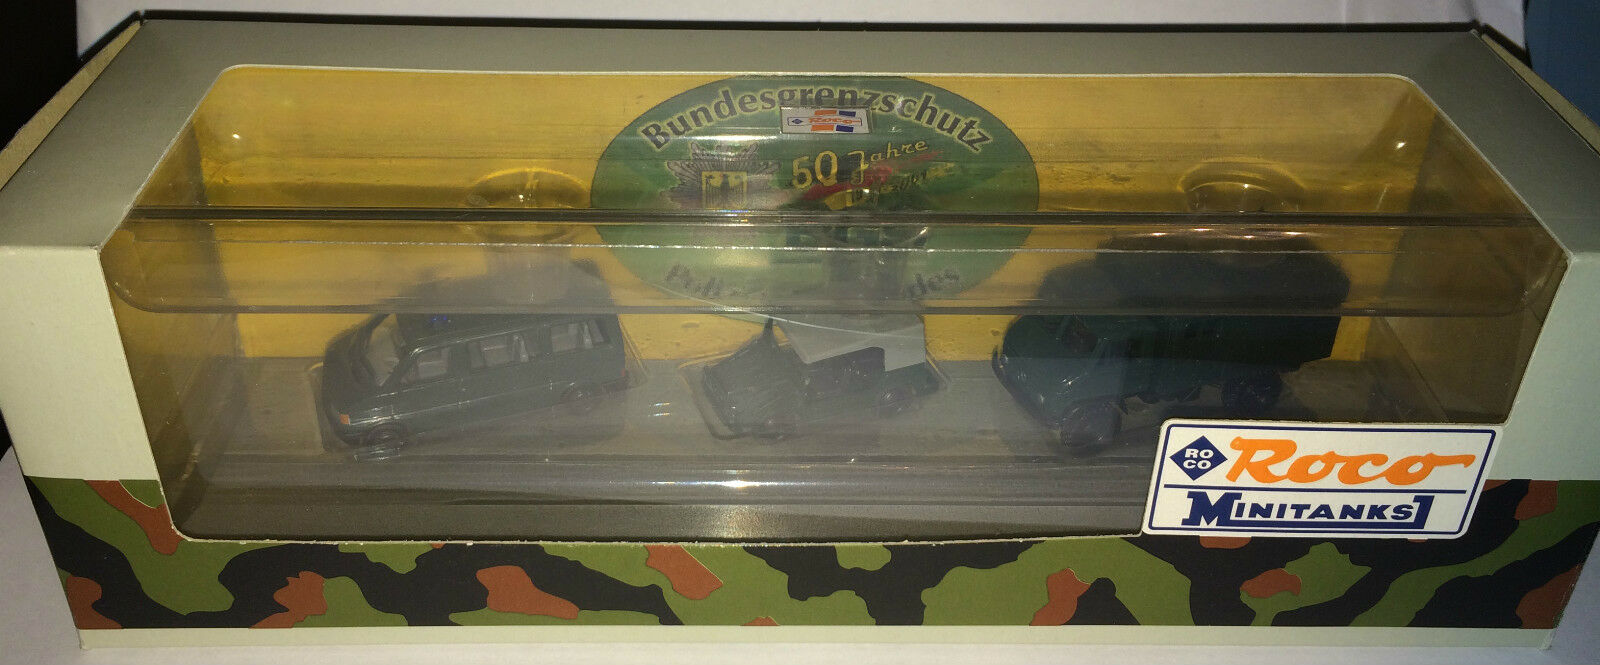 "Roco MINITANKS 668 – Set Unimog S 404, Munga + VW T4 ""BGS "" H0 1 87, neu + OVP"